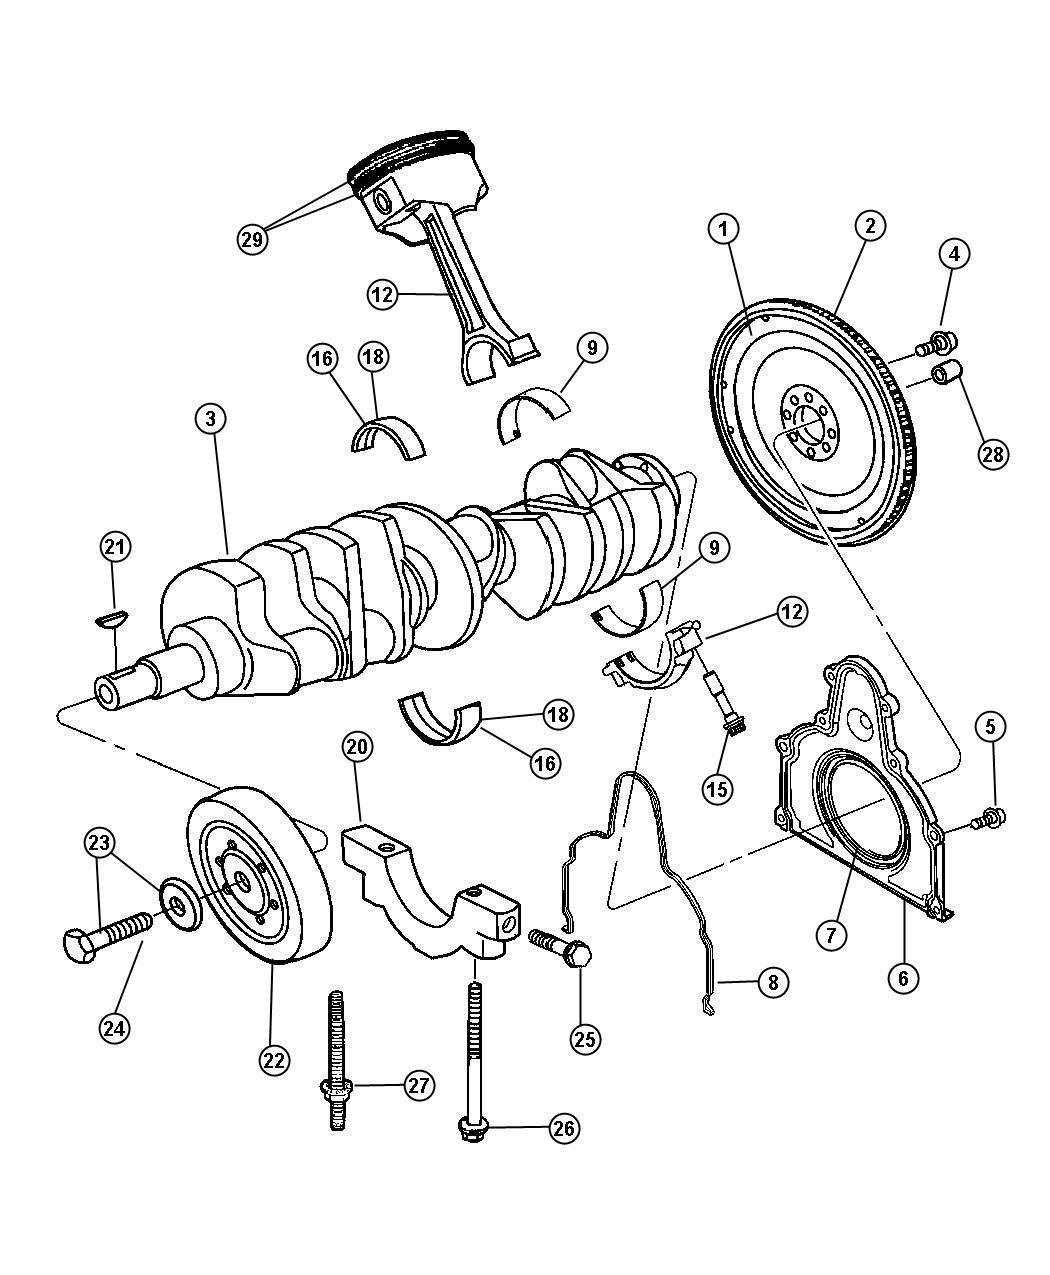 Dodge Ram 1500 Bolt. Connecting rod. [mj9x1.00-4h], mj9 x